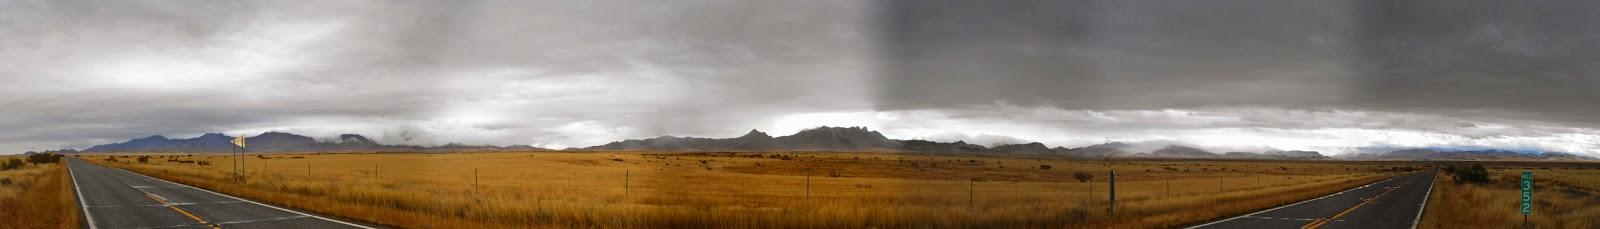 rainy road trip in cochise county arizona